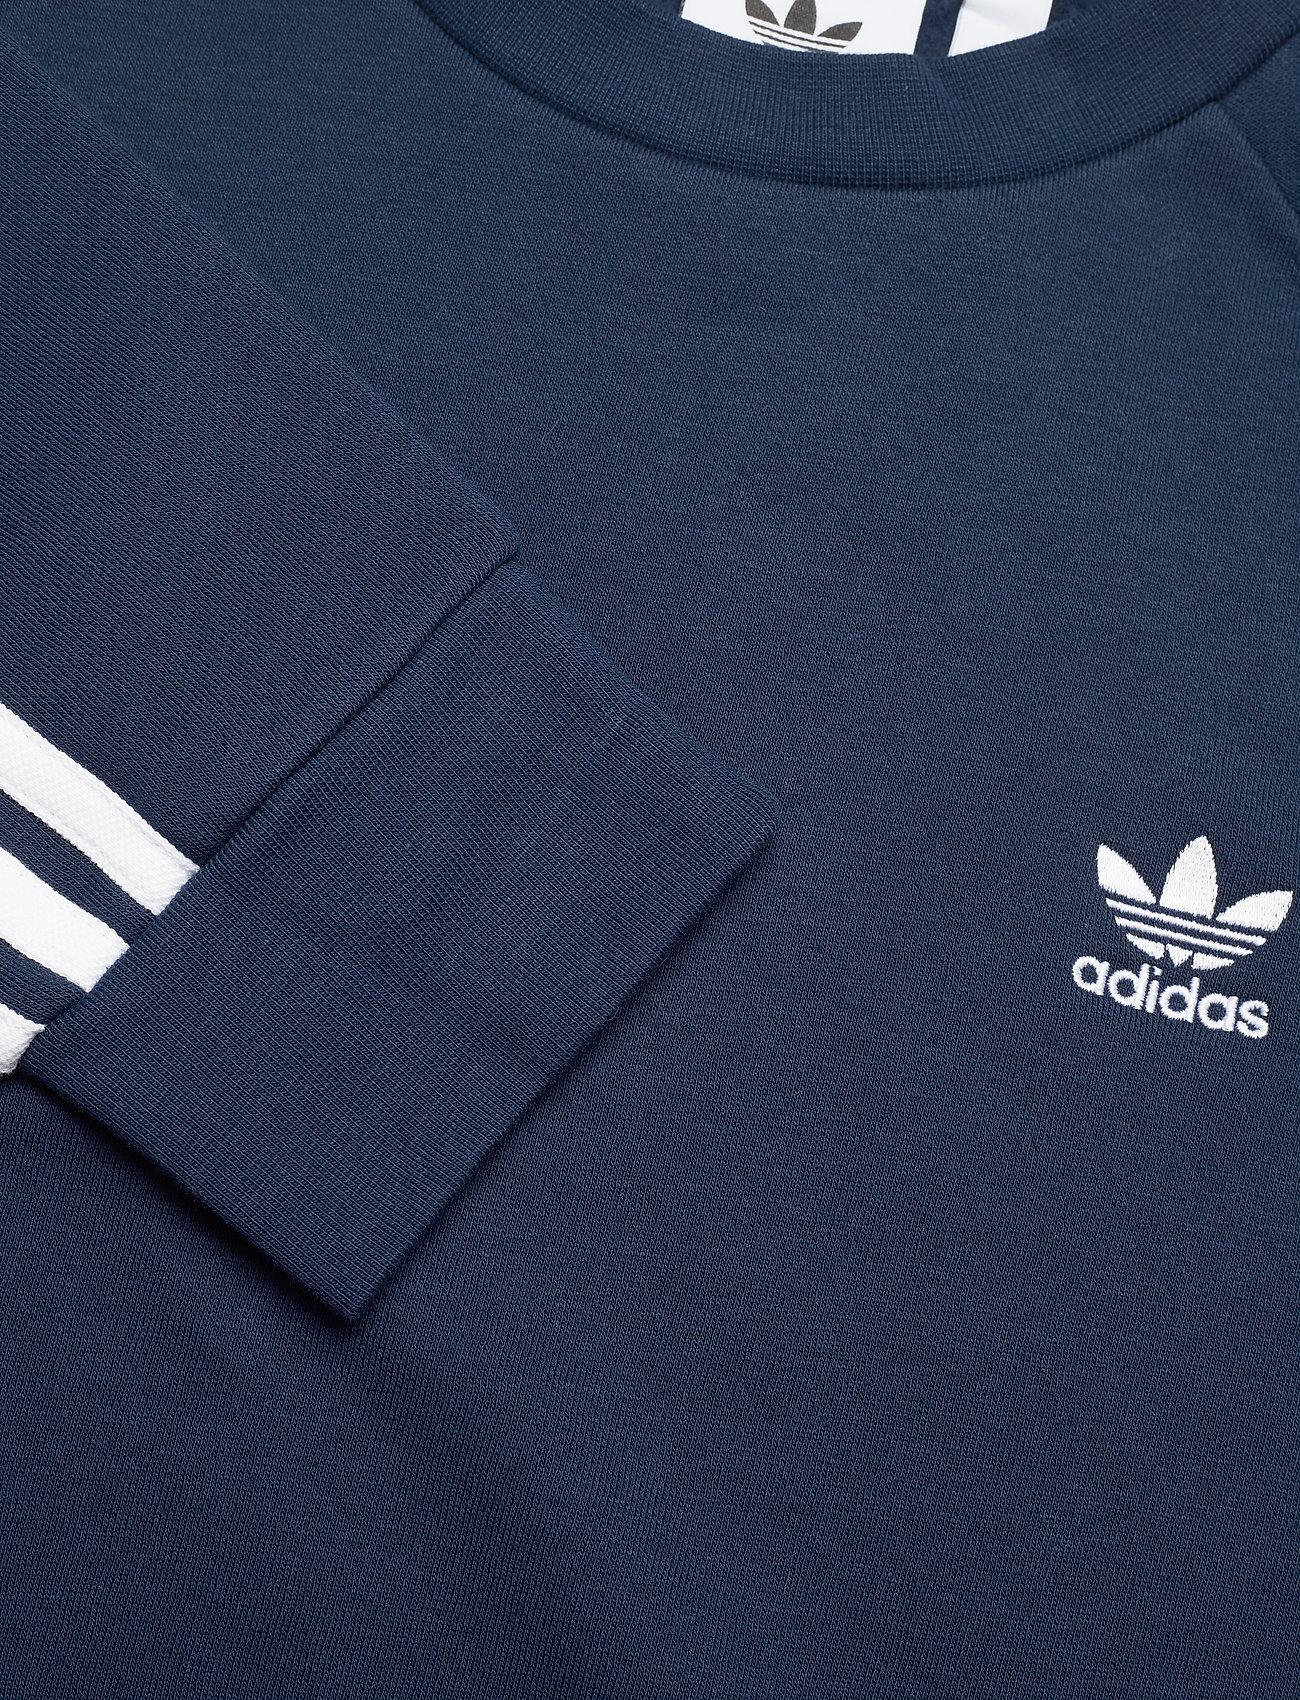 adidas Originals 3-STRIPES CREW - Sweatshirts CONAVY - Menn Klær